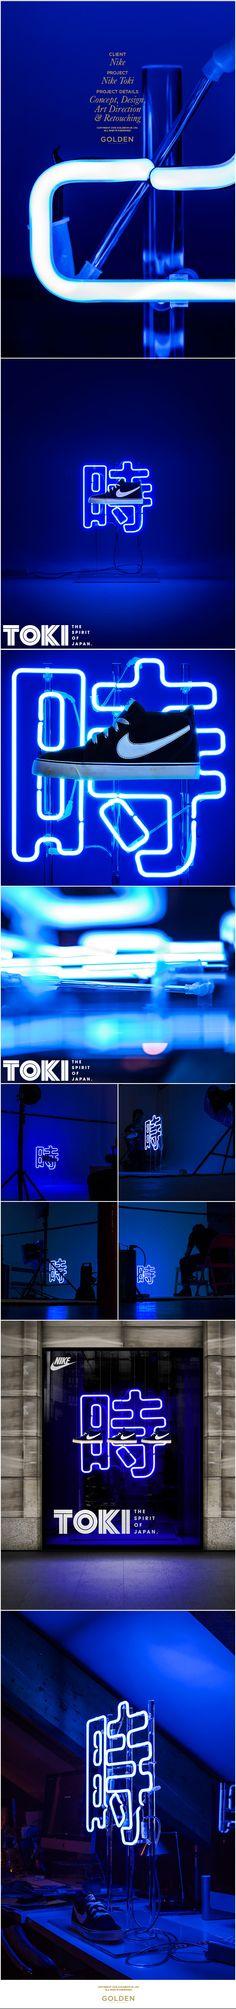 Nike Toki by Golden , via Behance